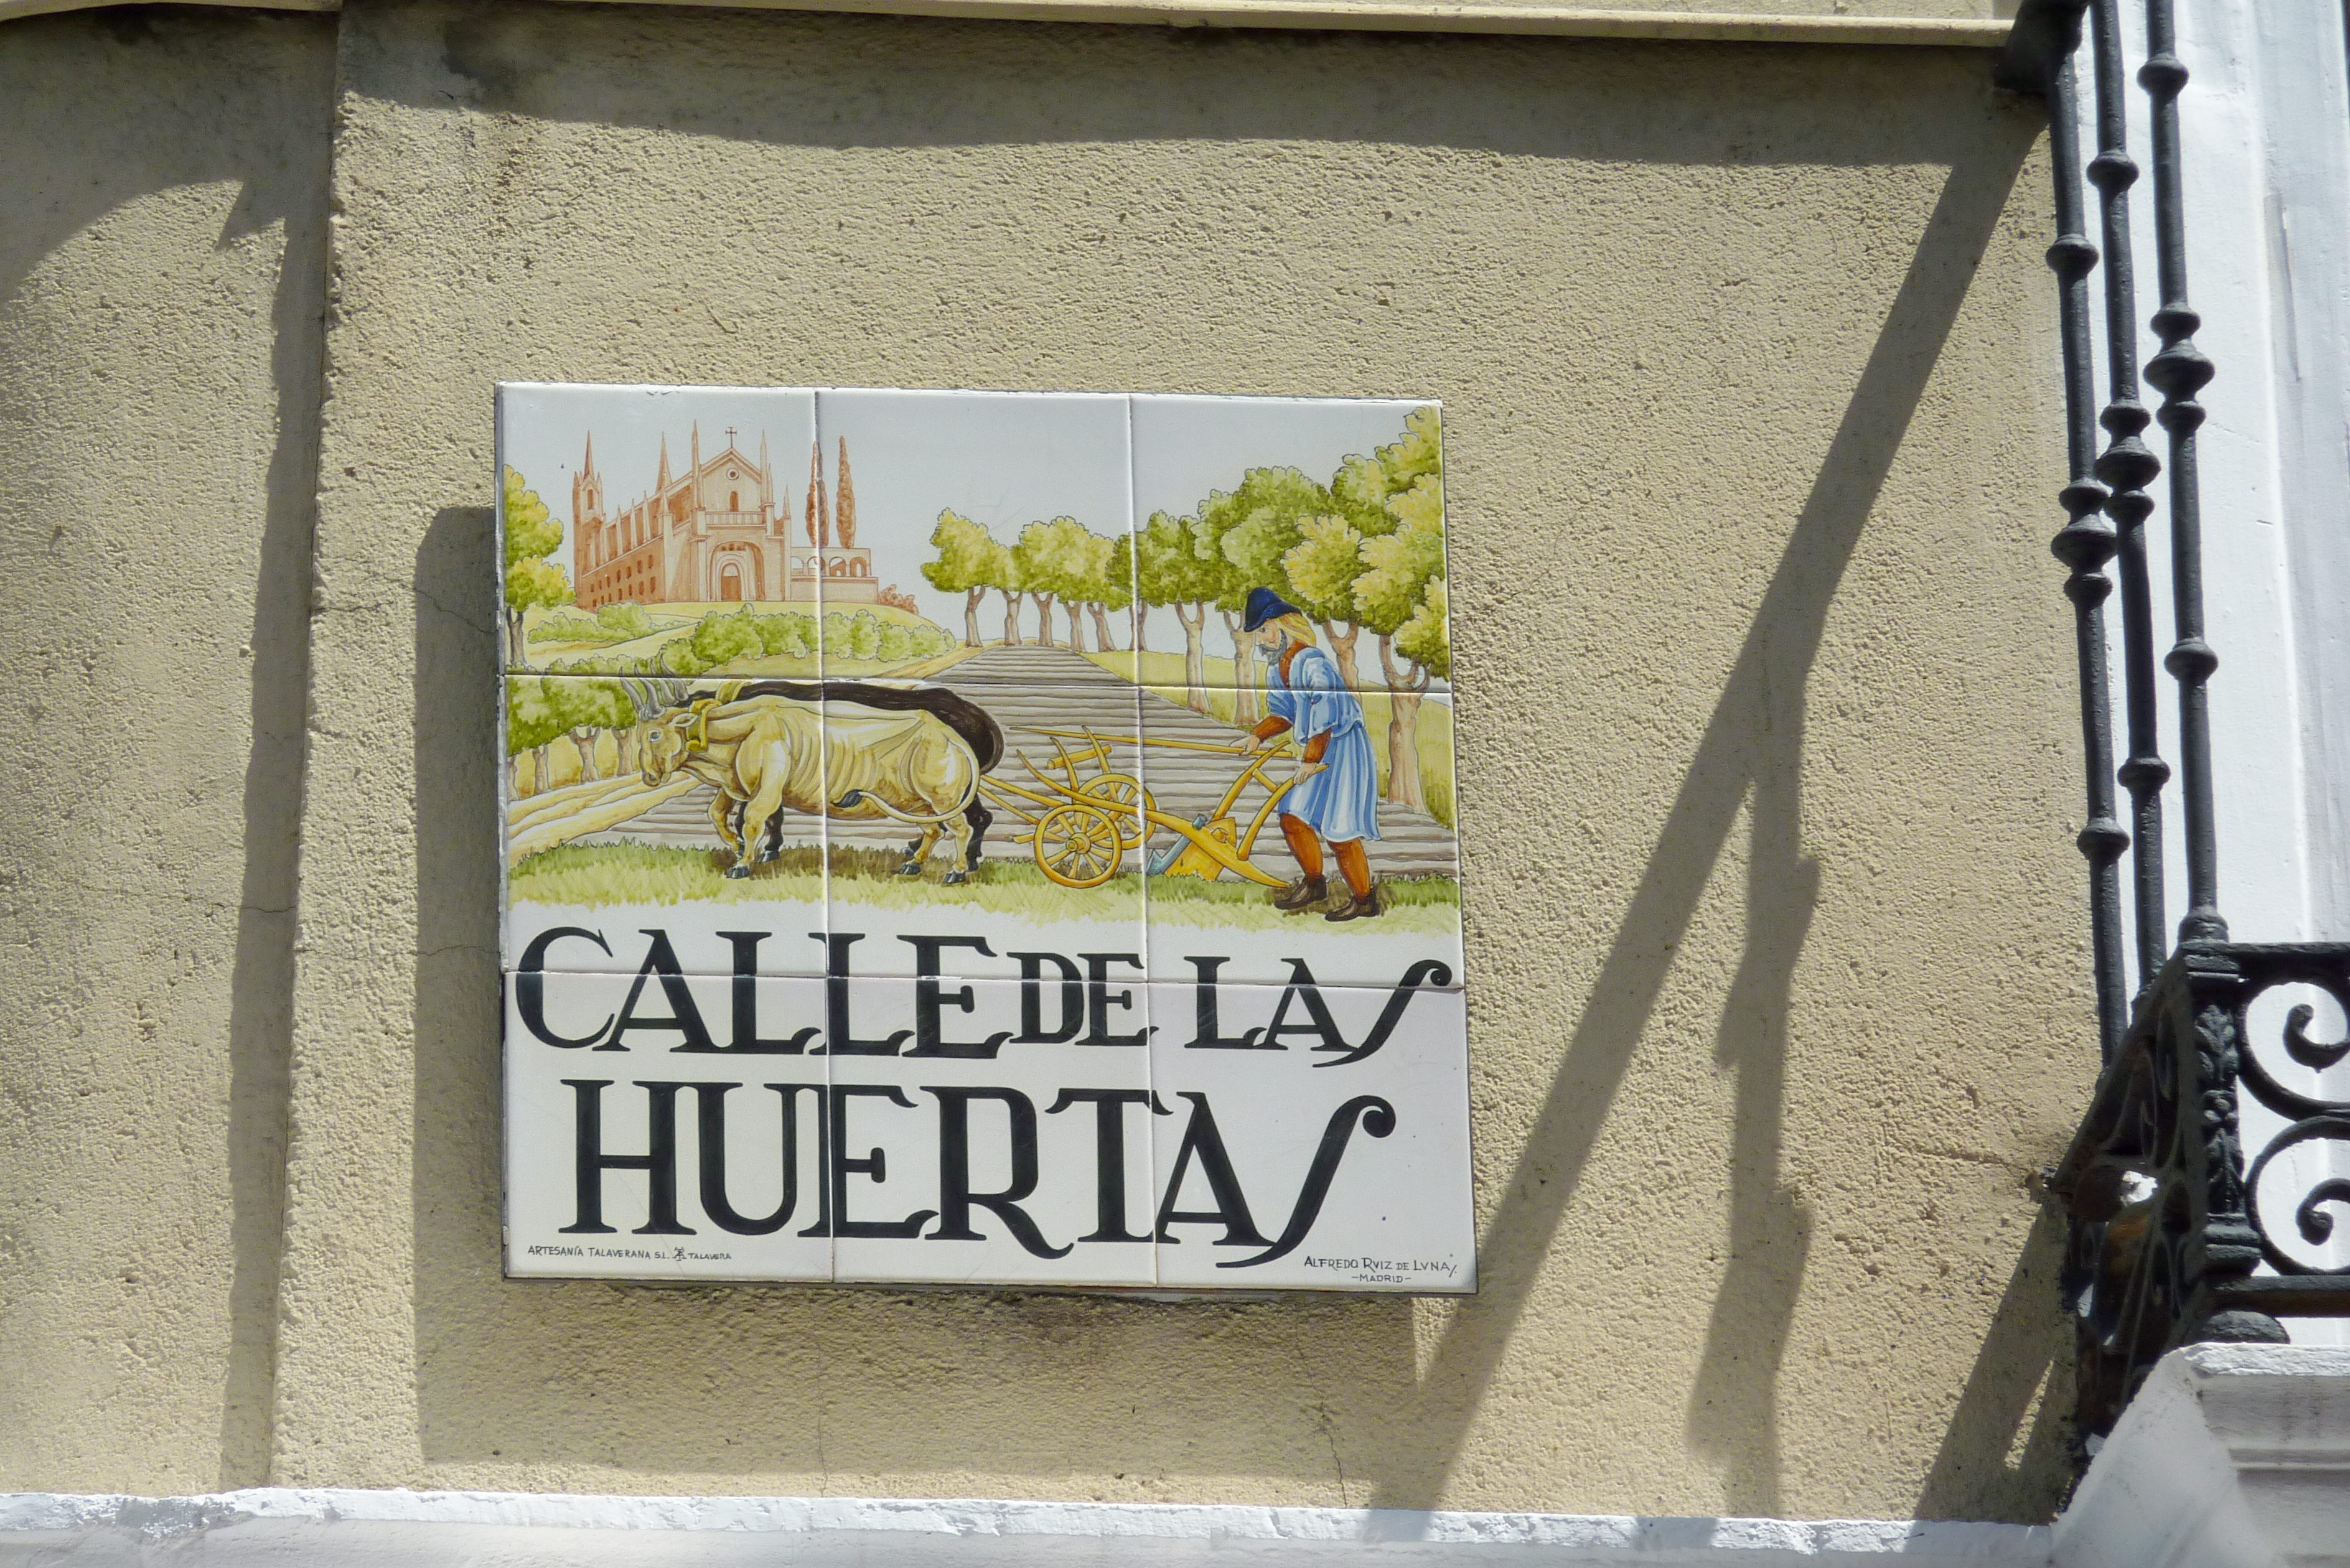 File:Madrid Calle de las Huertas 015.JPG - Wikimedia Commons